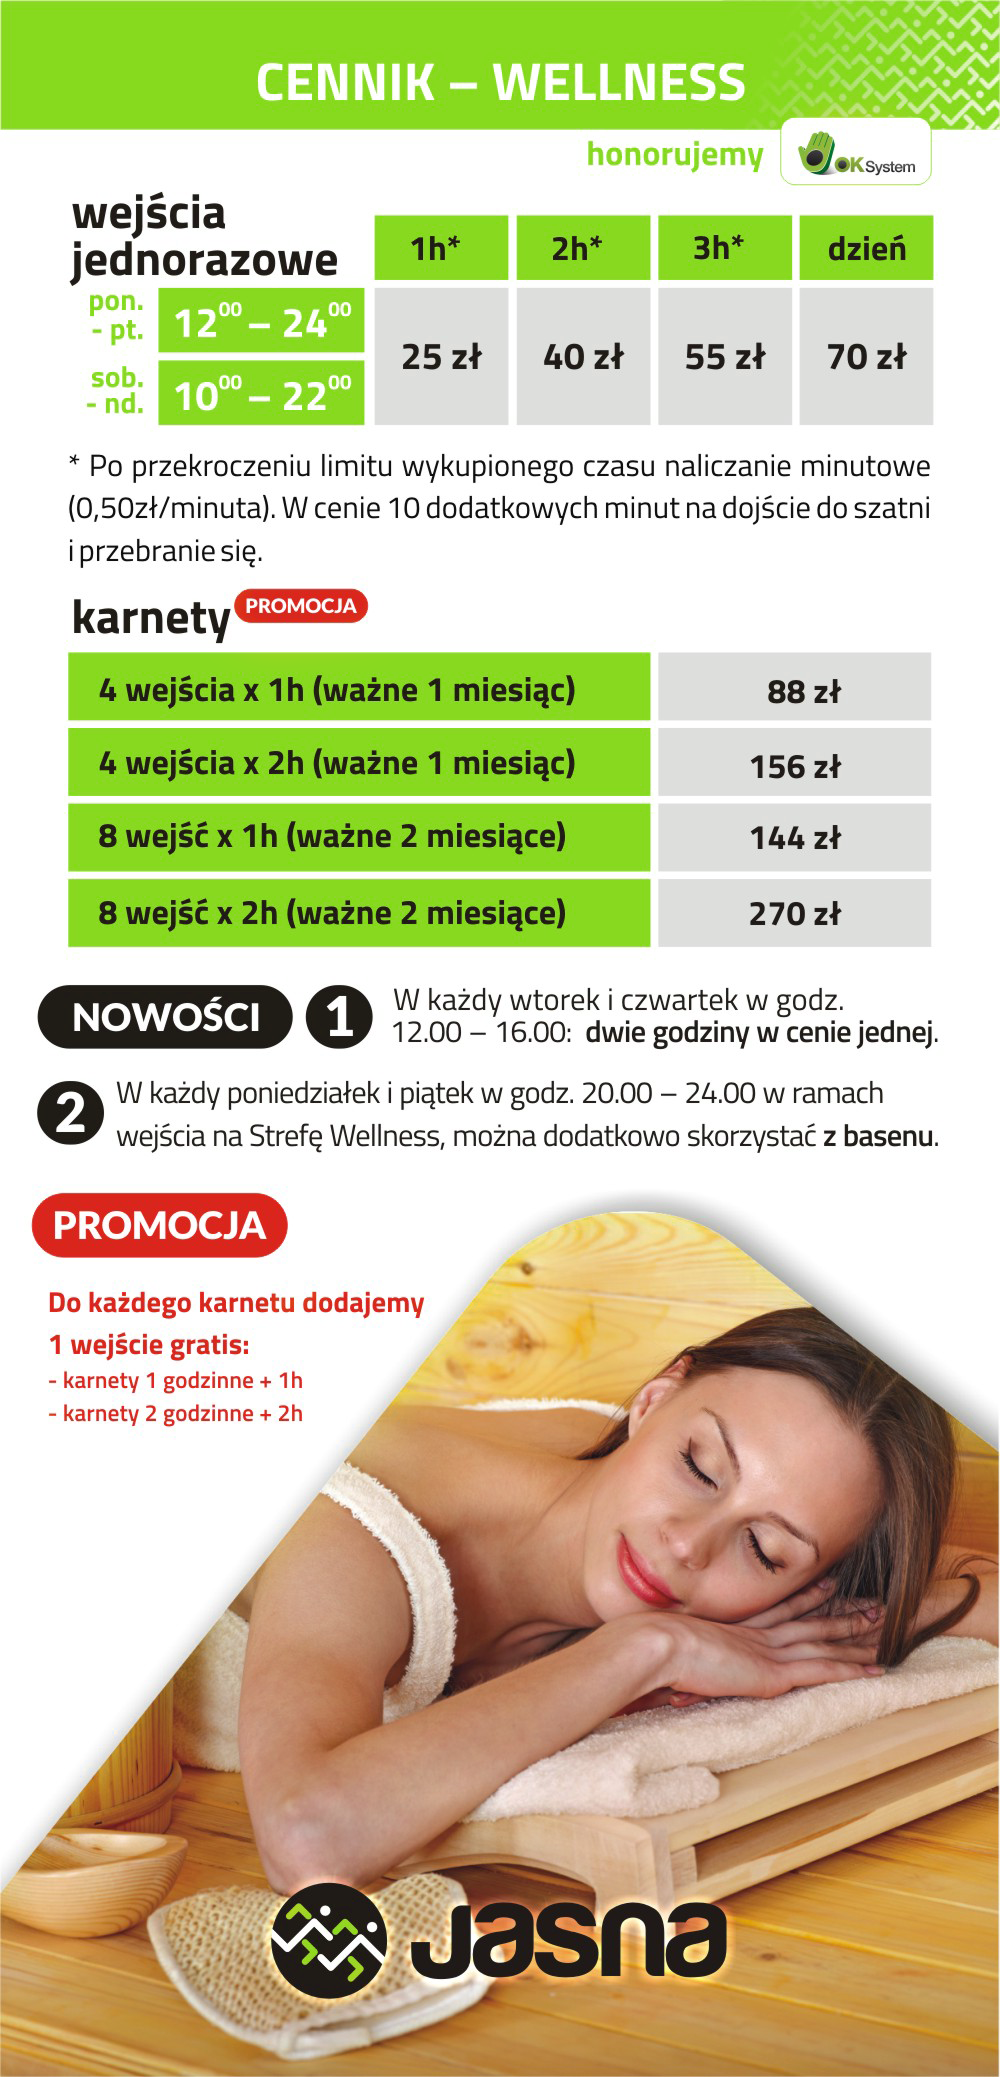 Cennik Wellness